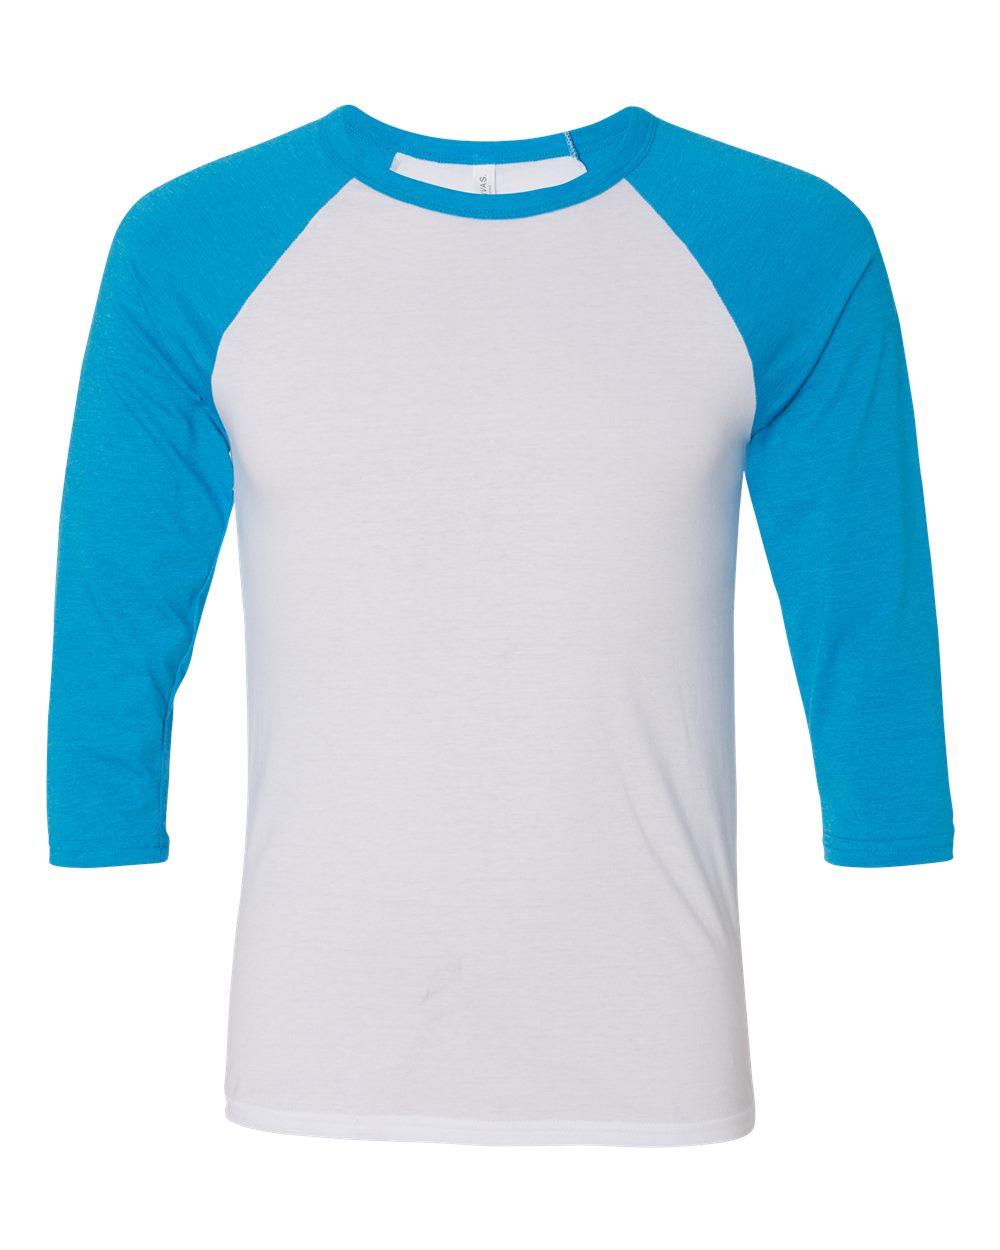 T Shirt Design In Bulk